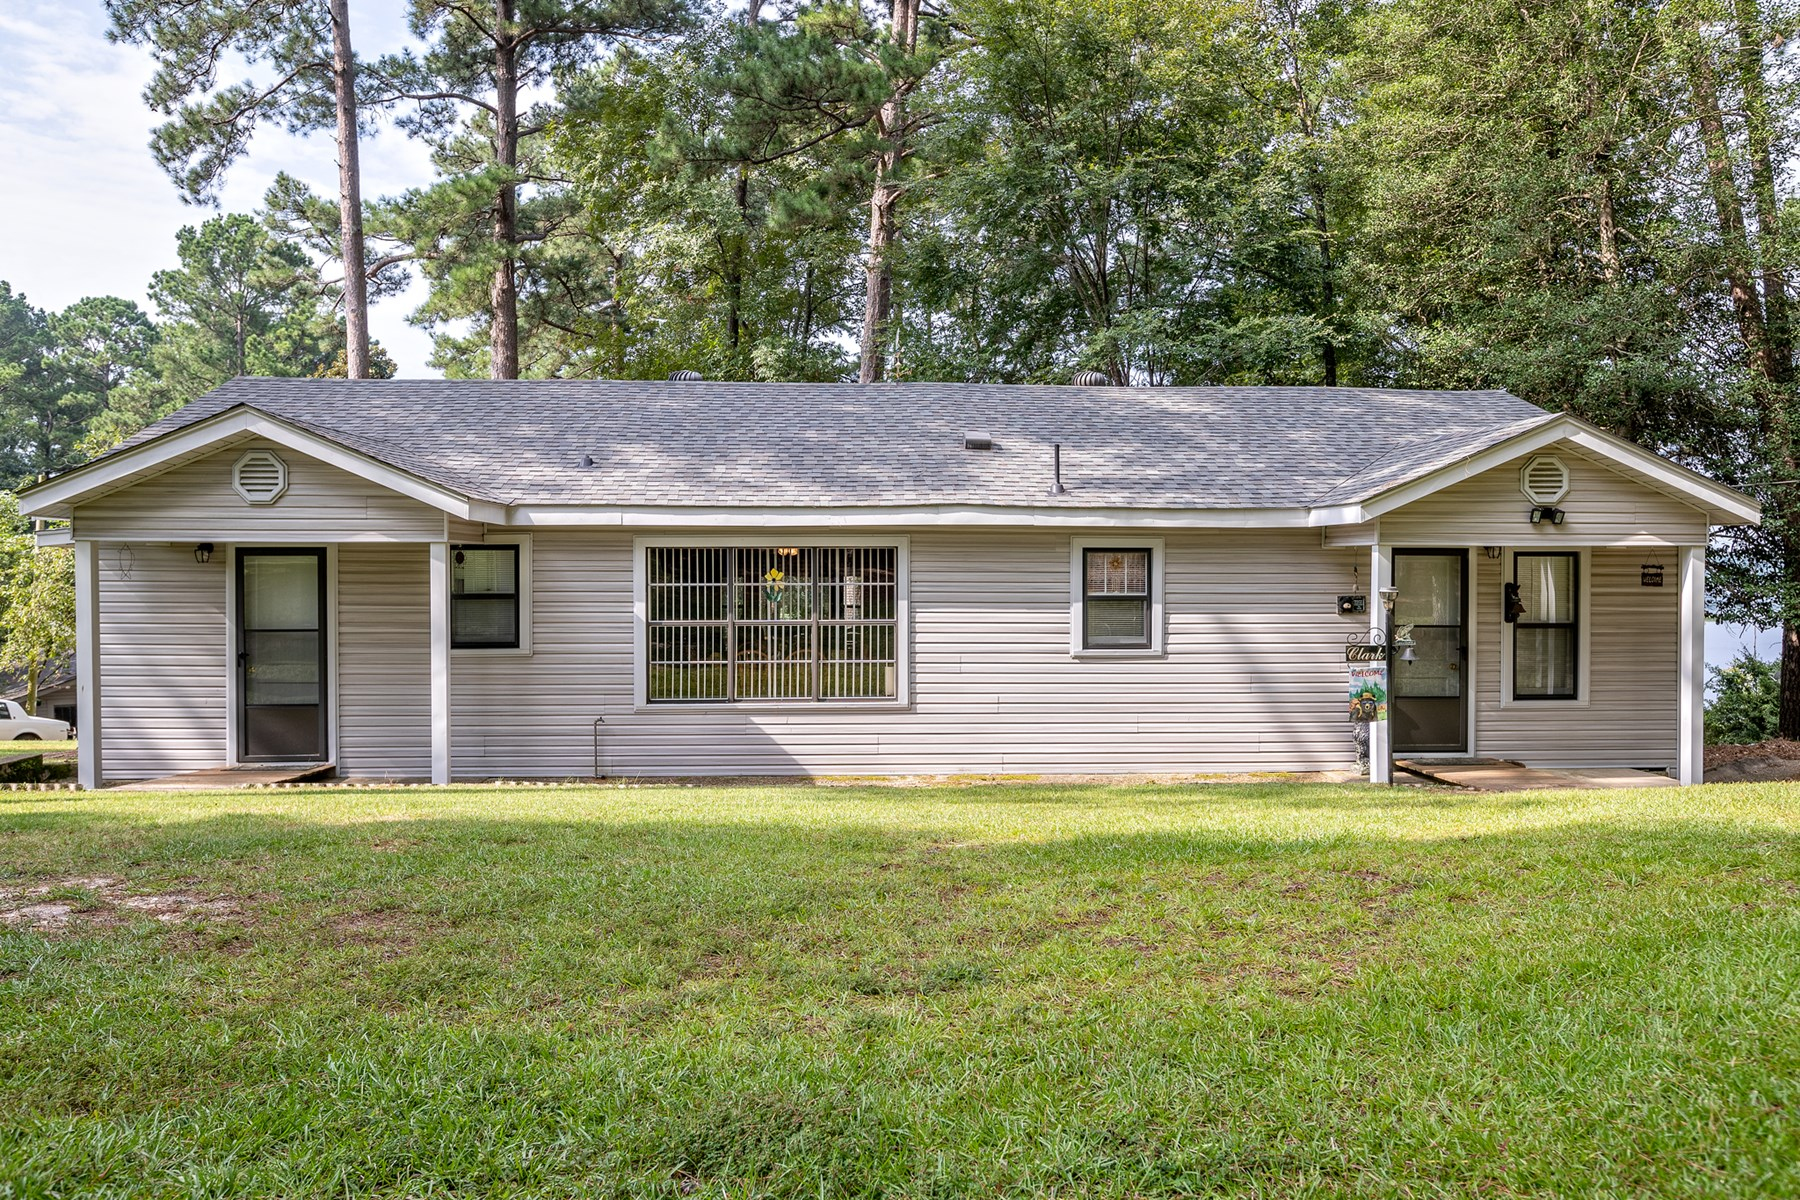 Arkadelphia Arkansas Real Estate - Homes, Farms, Ranches